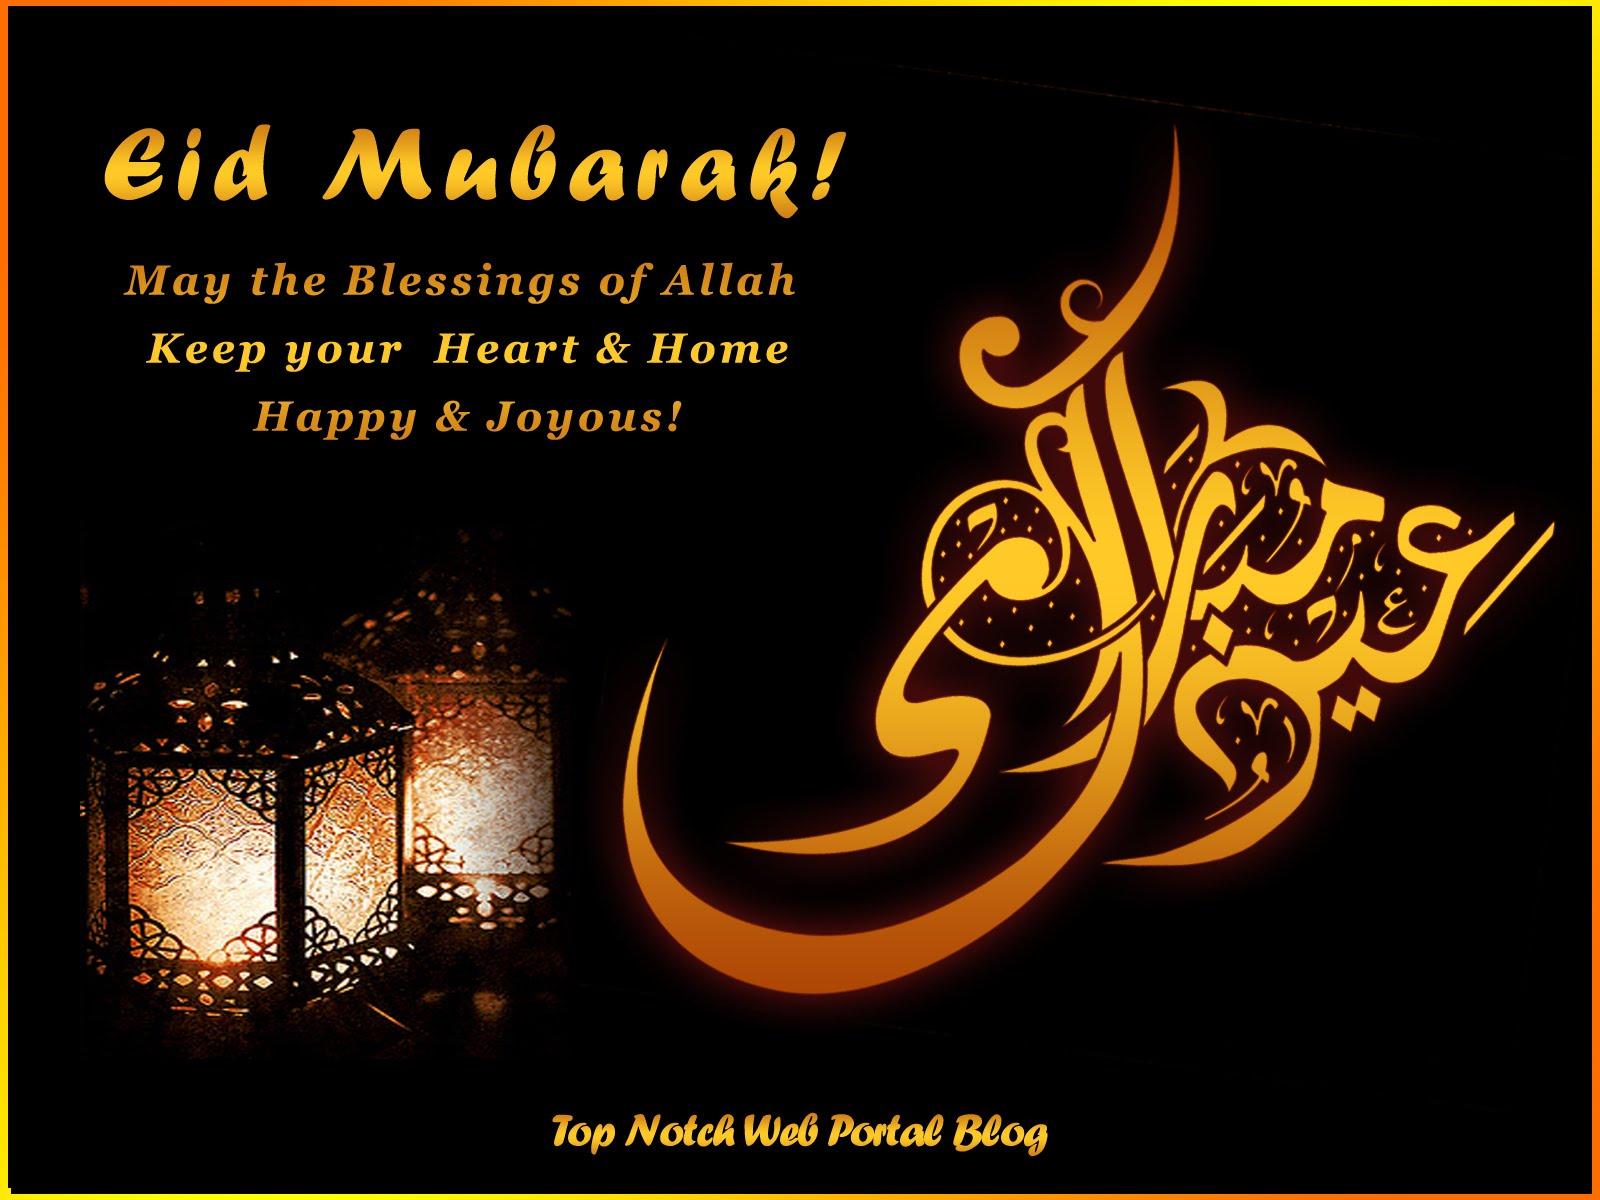 eid mubarak - photo #6